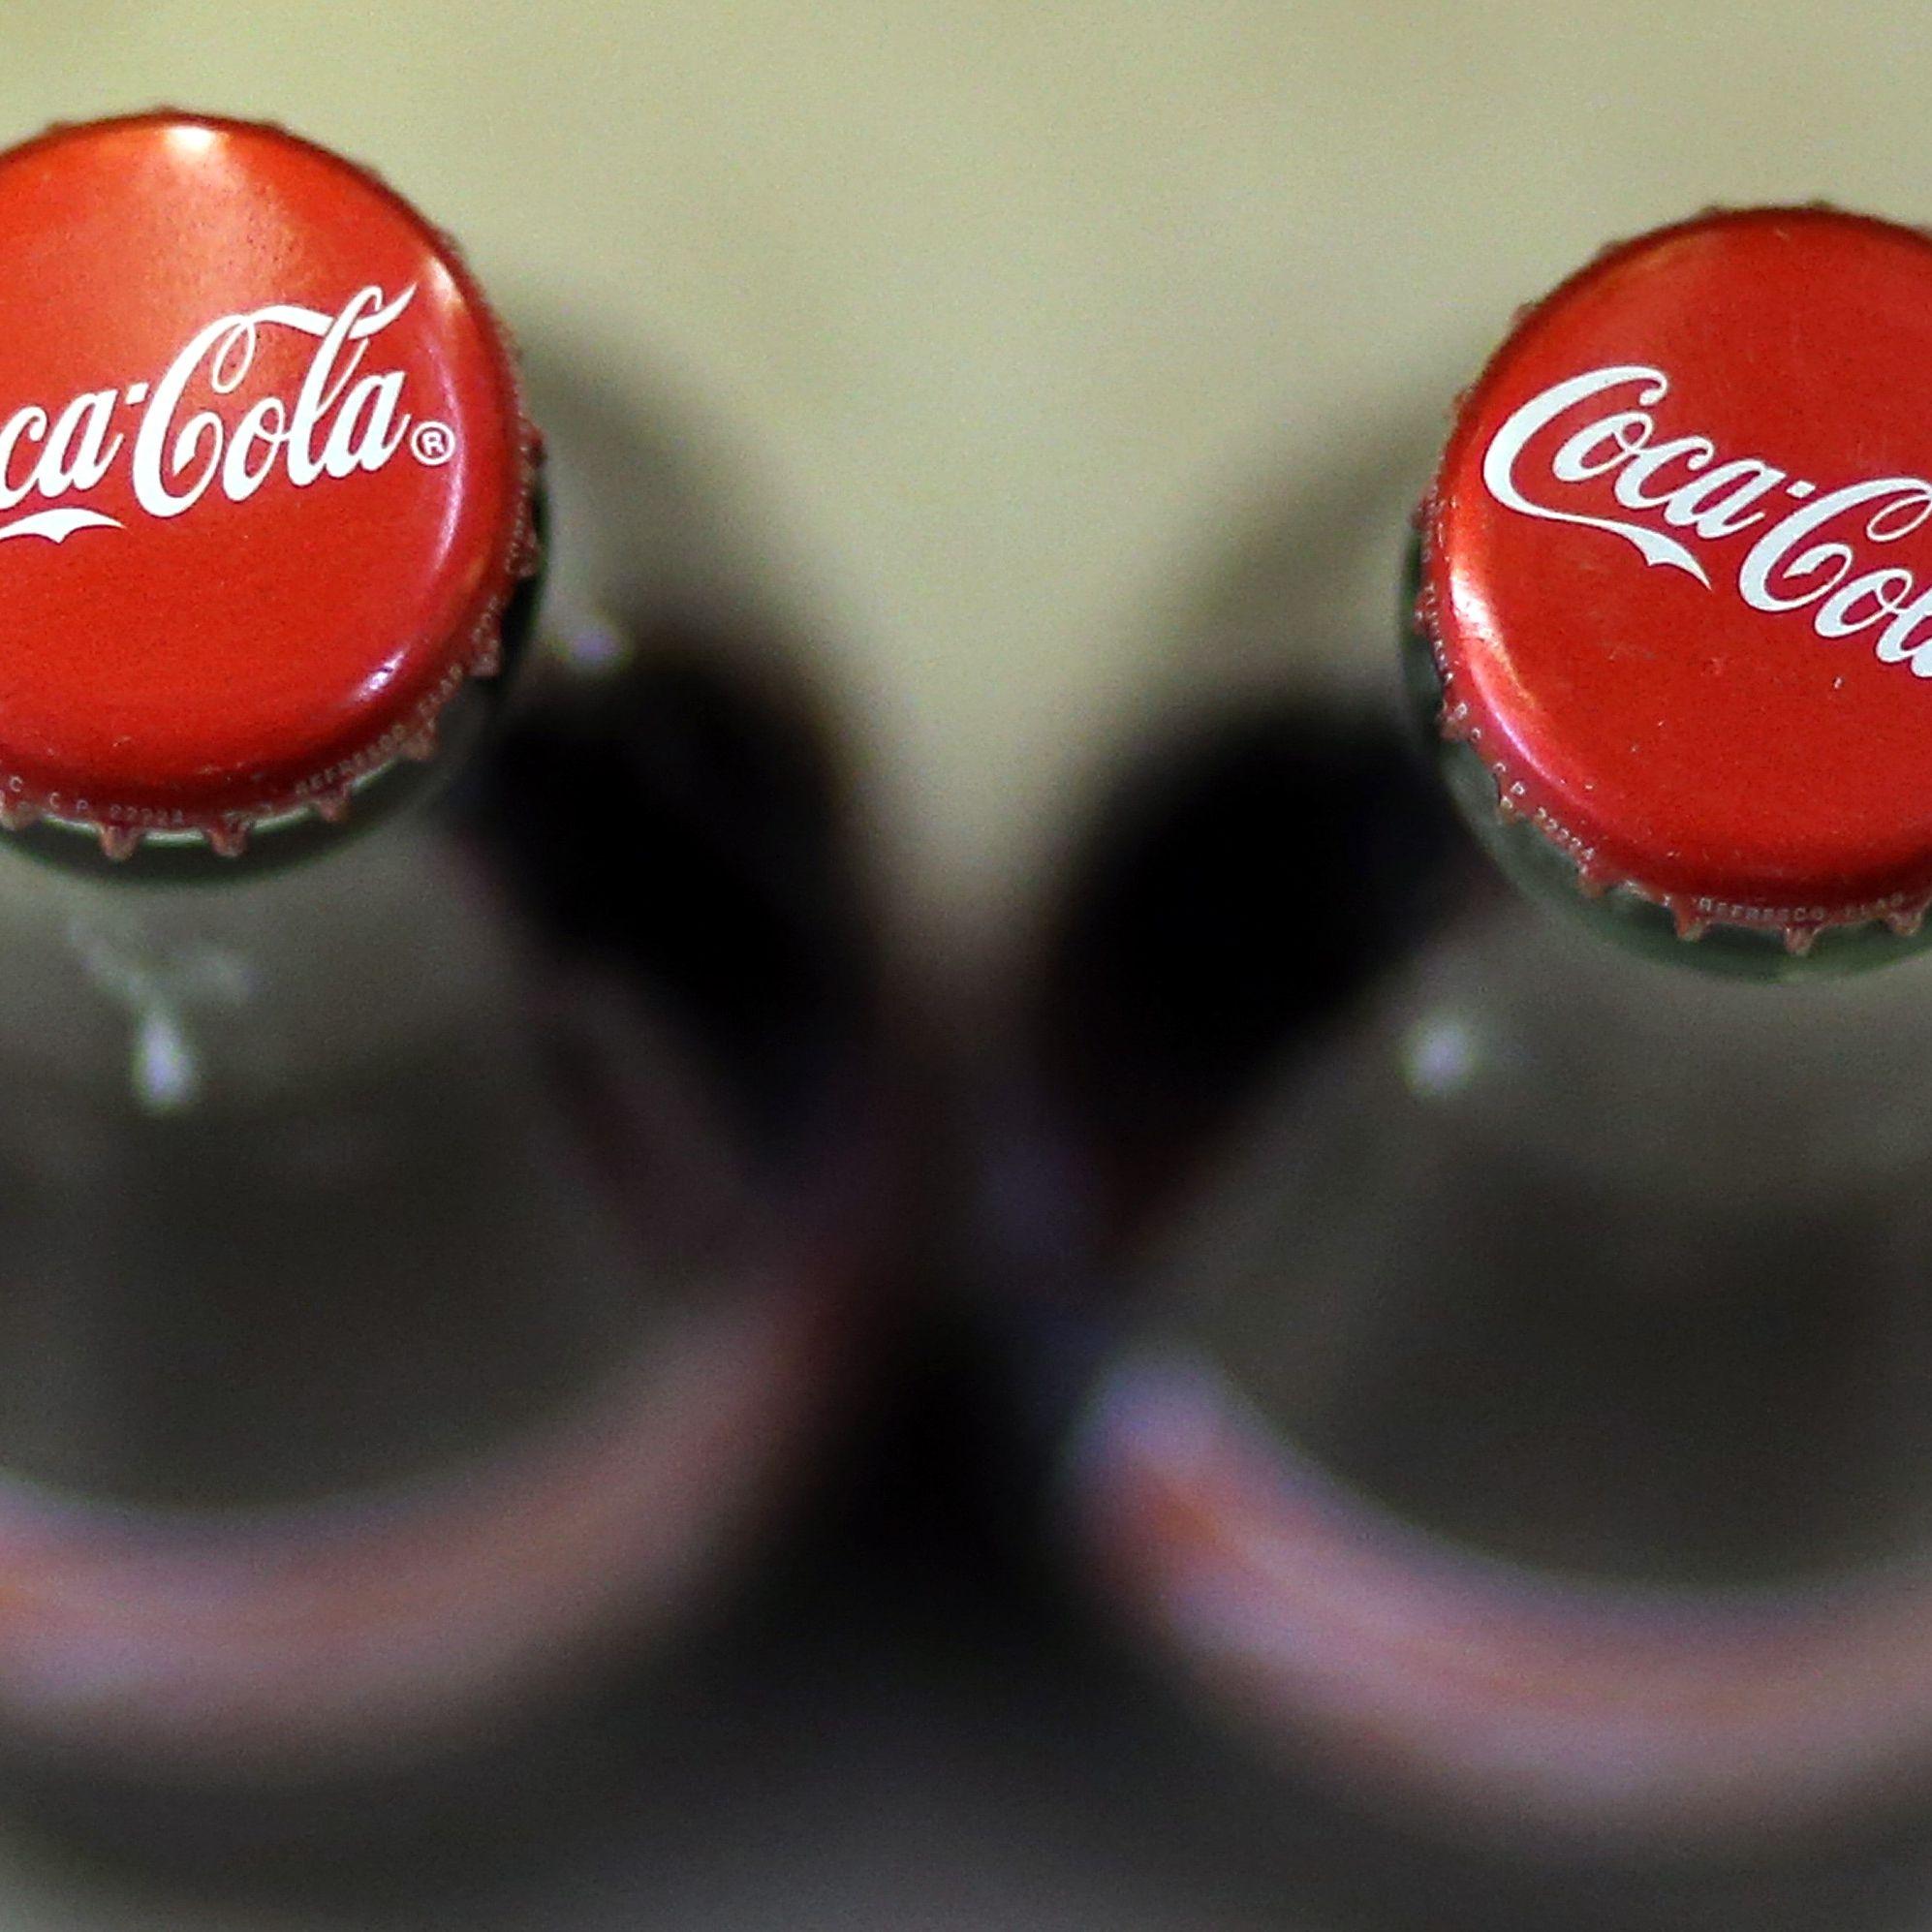 The History of Coca-Cola and John Pemberton